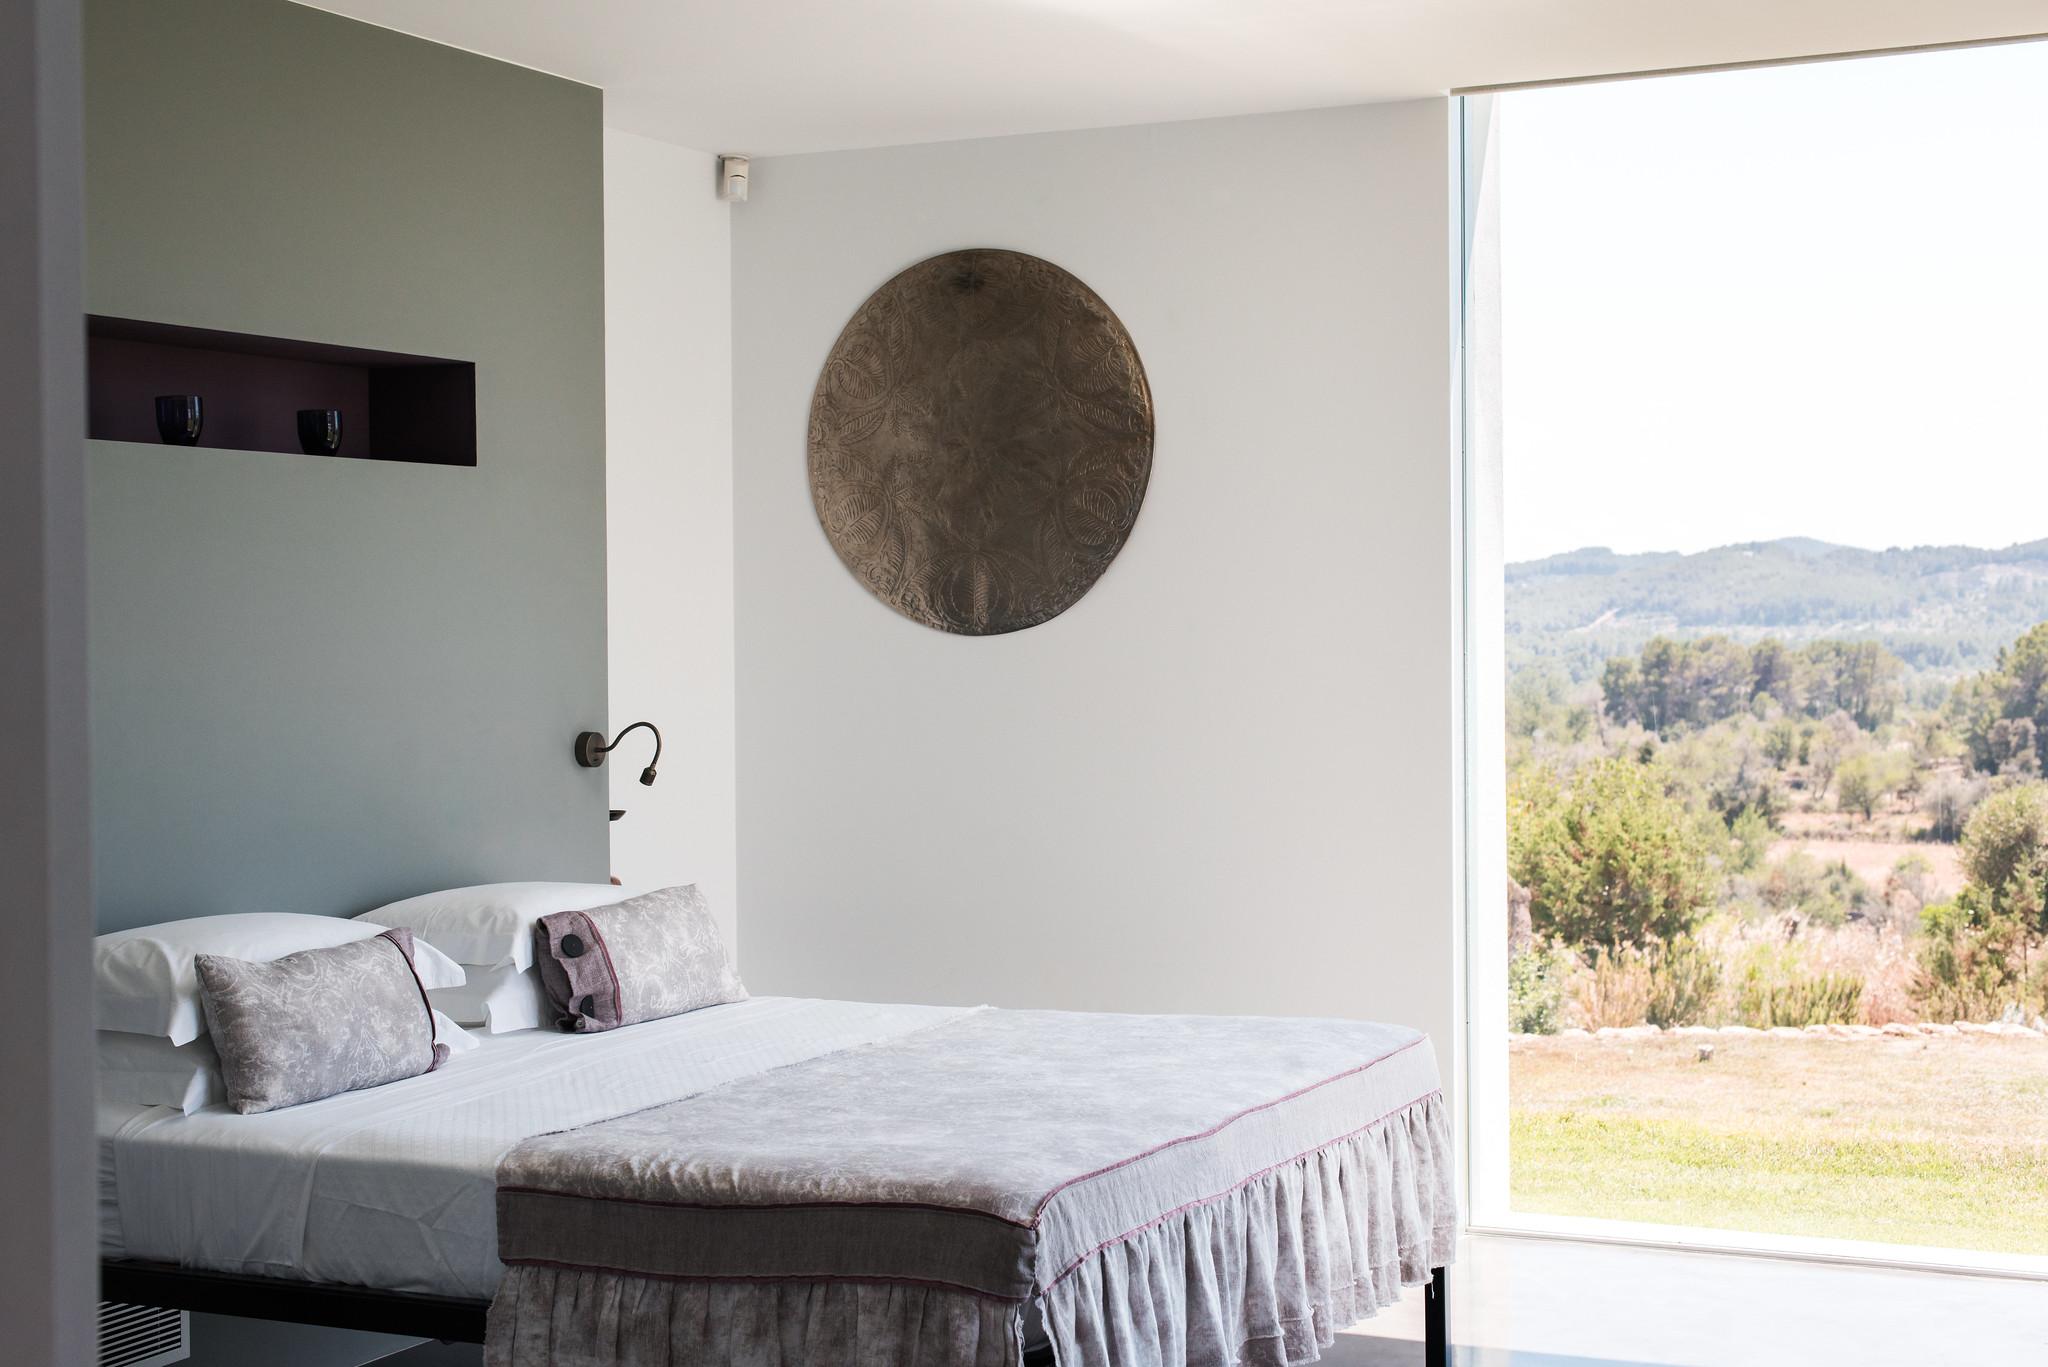 https://www.white-ibiza.com/wp-content/uploads/2020/05/white-ibiza-villas-can-zama-bedroom-three-double.jpg